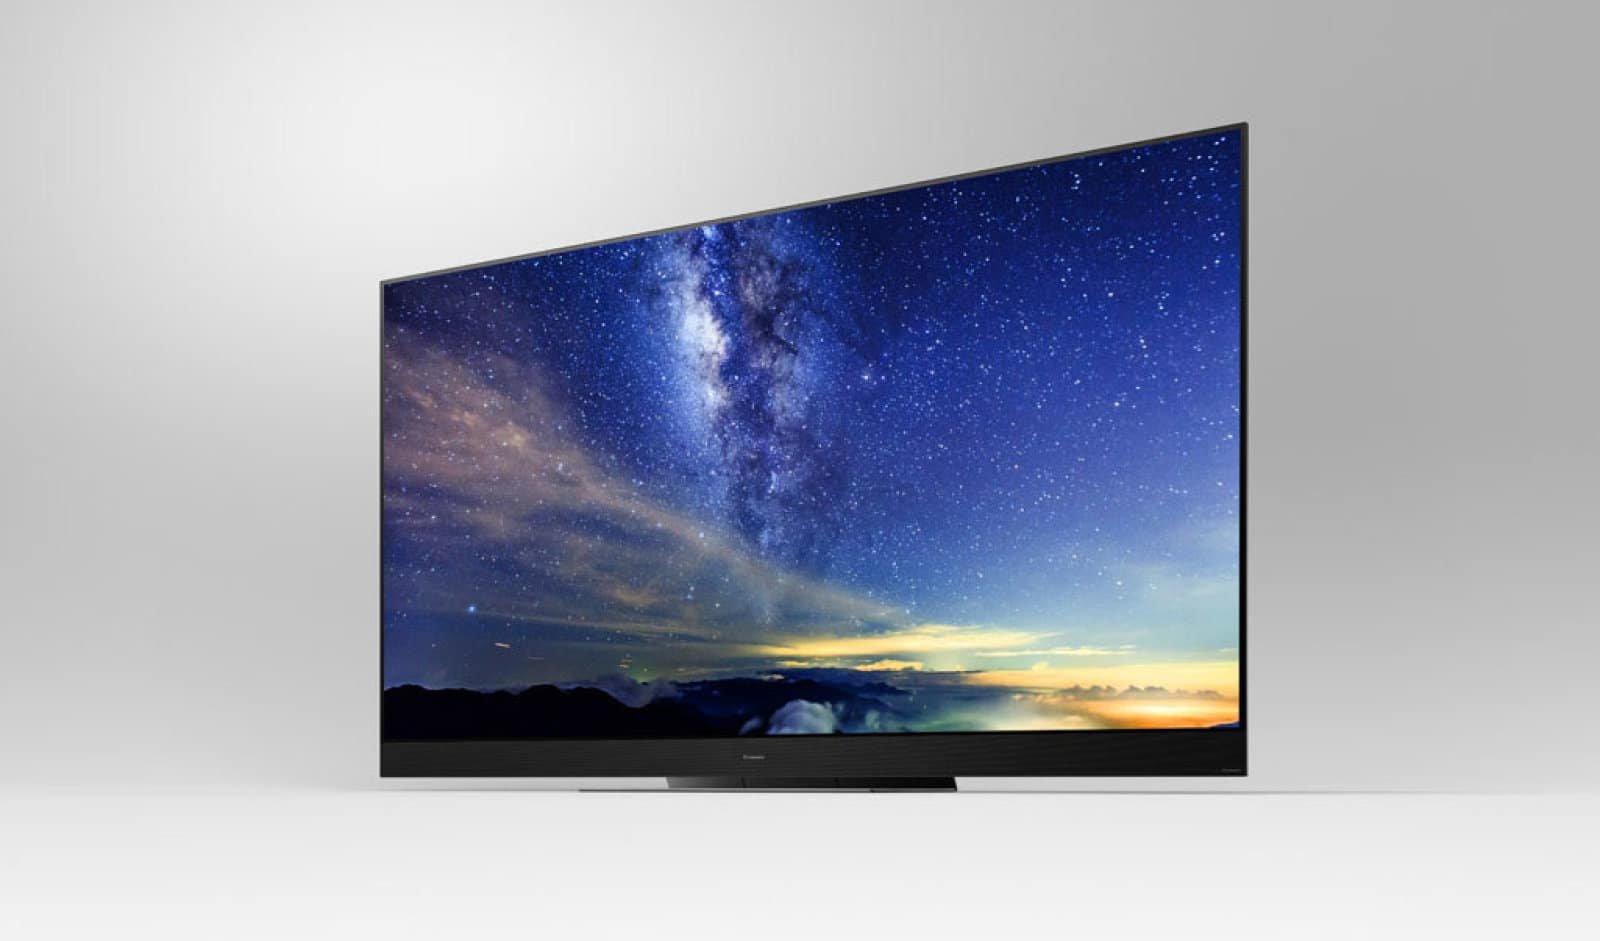 Smart TV OLED GZ2000 de Panasonic